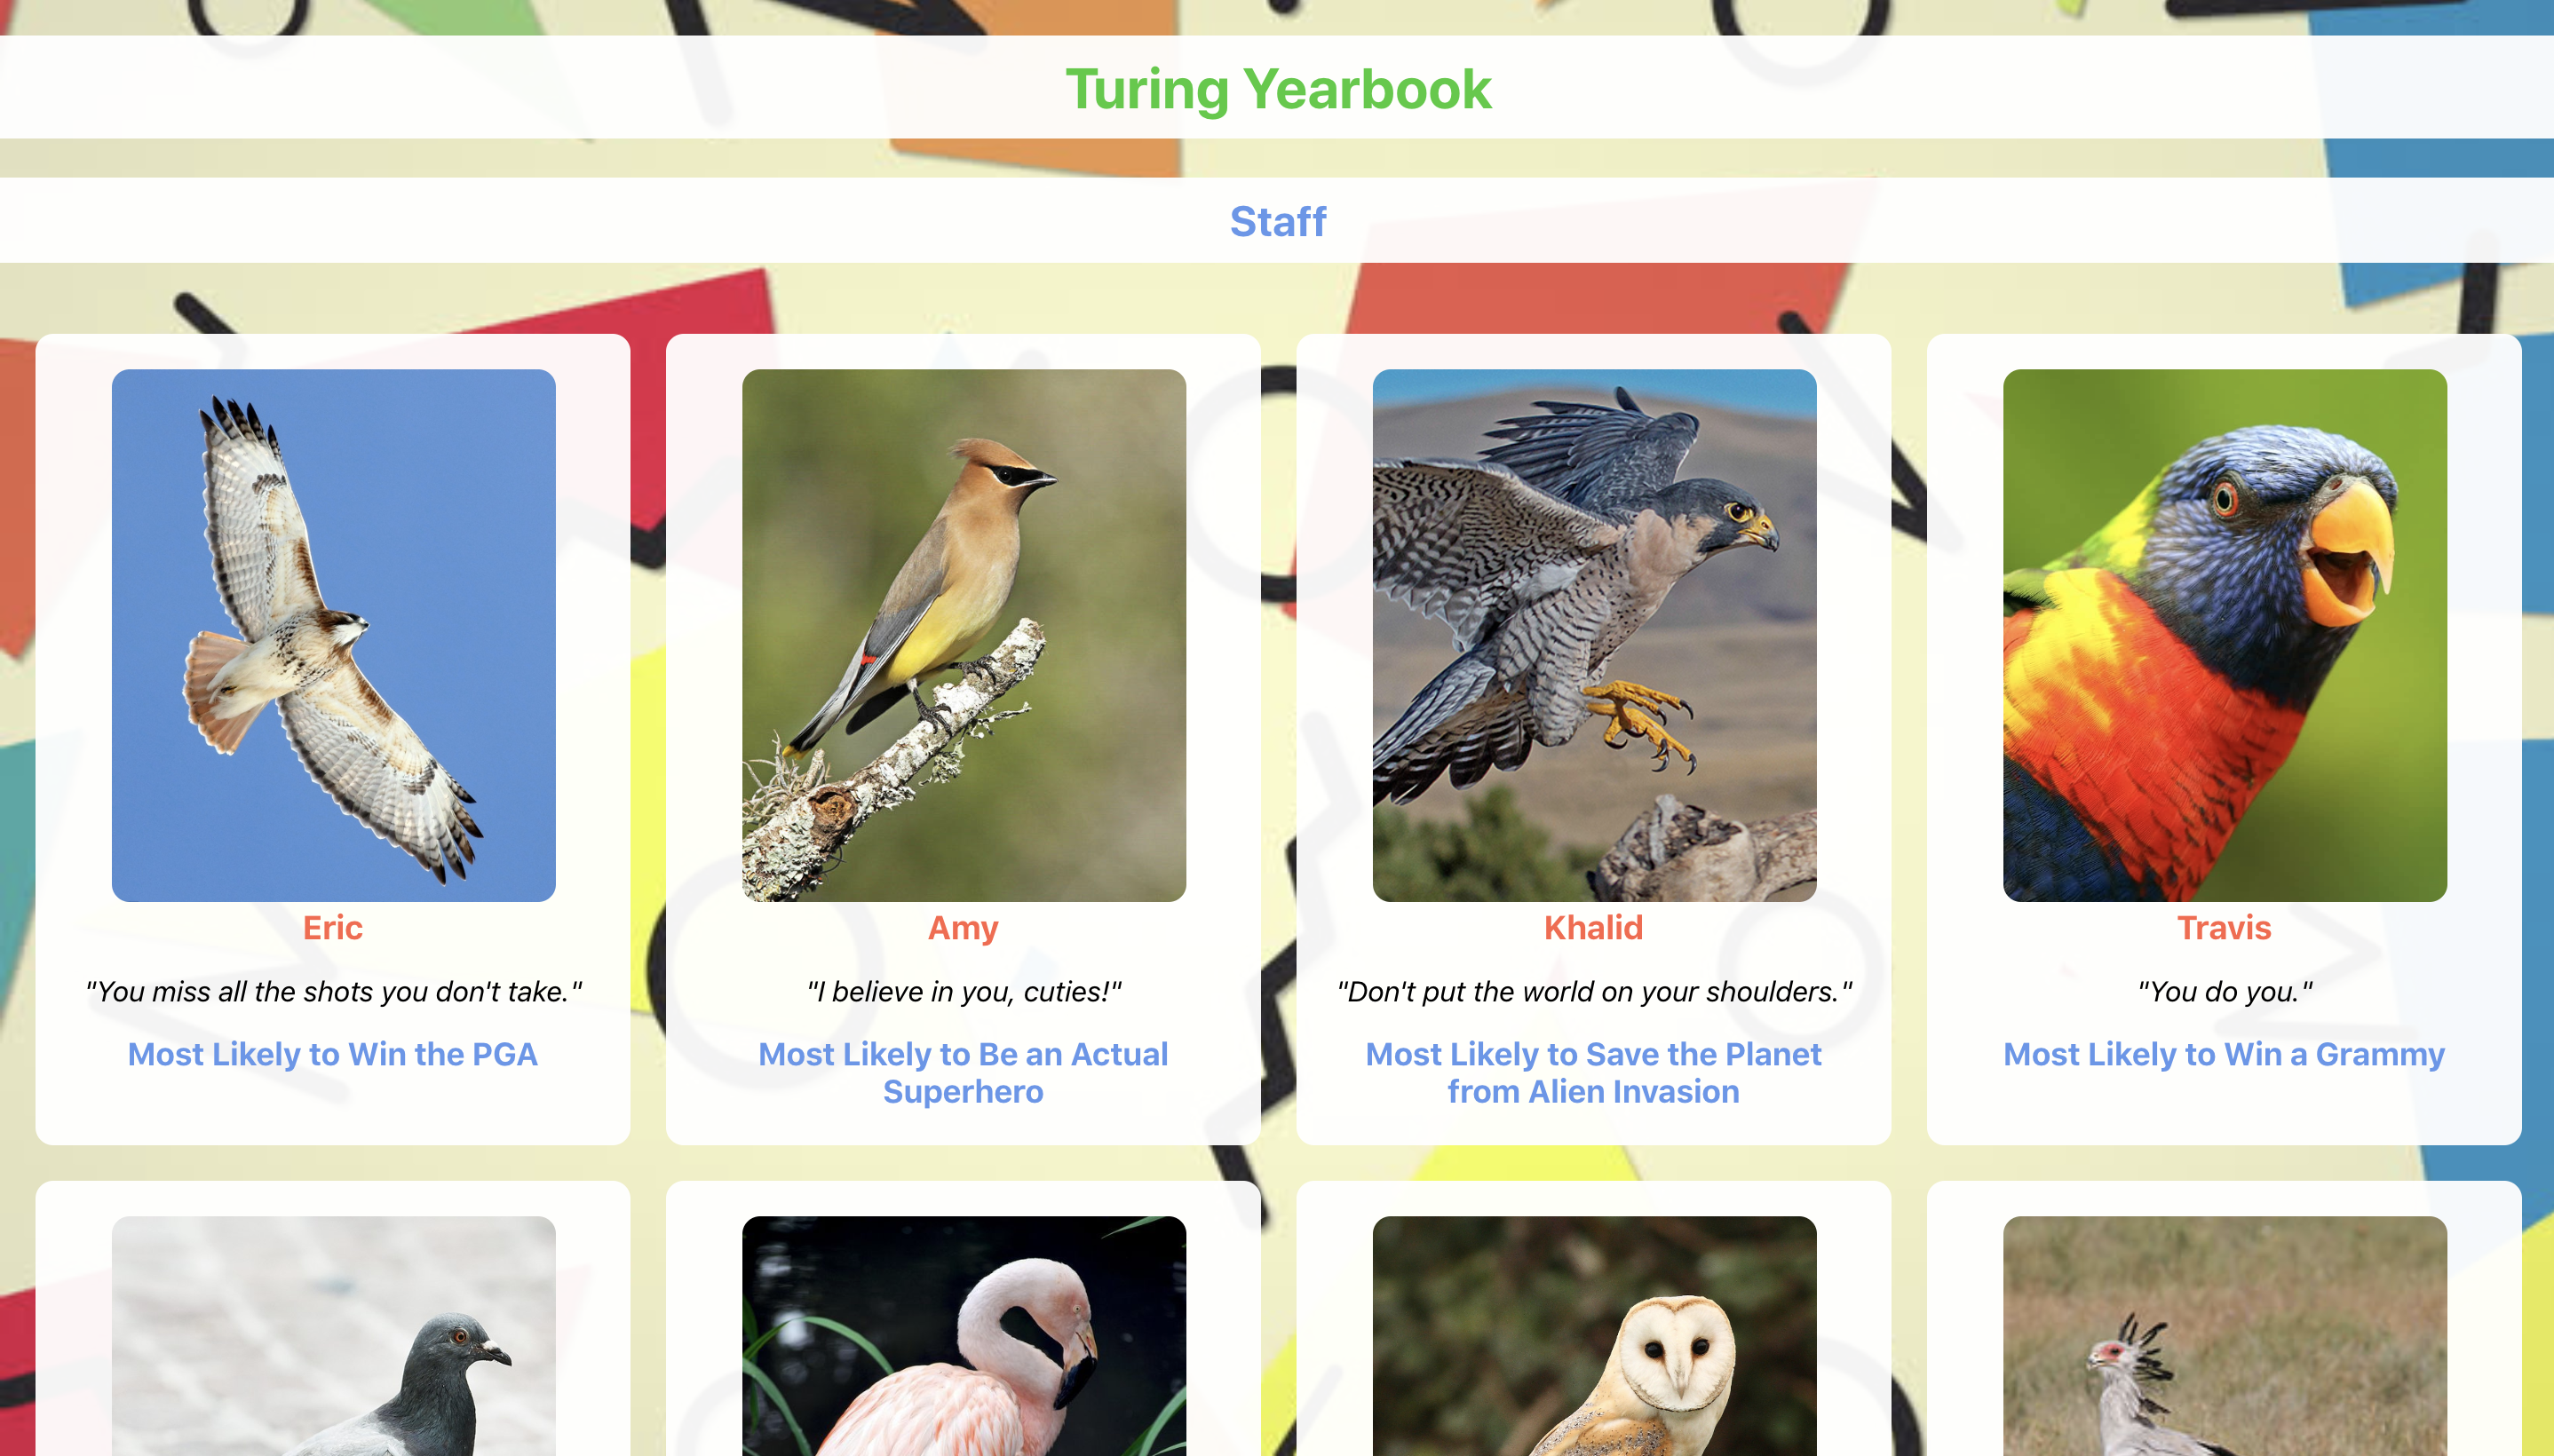 turing yearbook screenshot